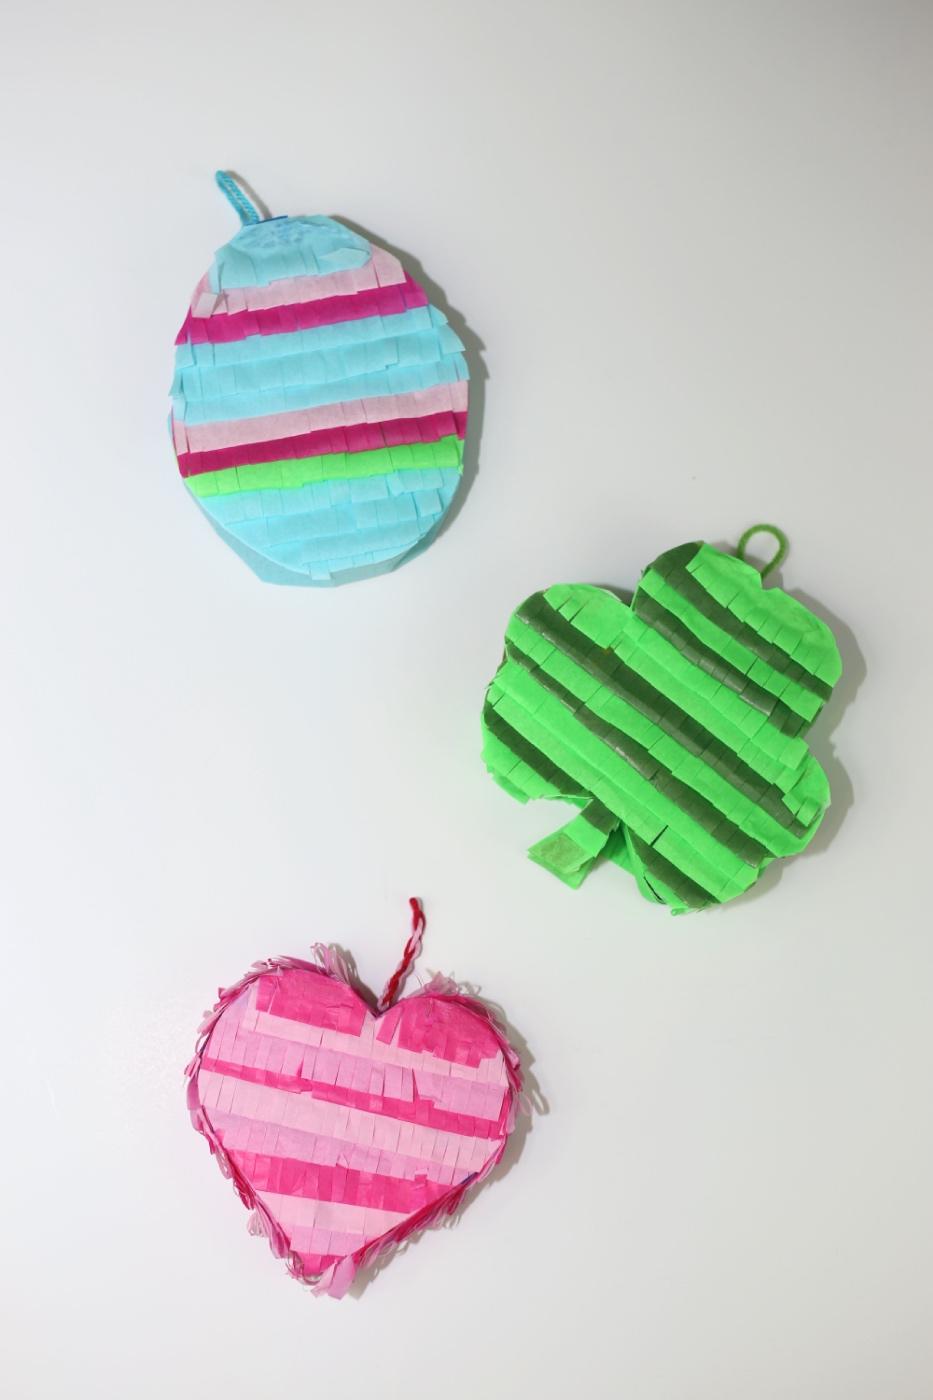 egg shamrock and heart pinata diy craft tutorial pop shop america